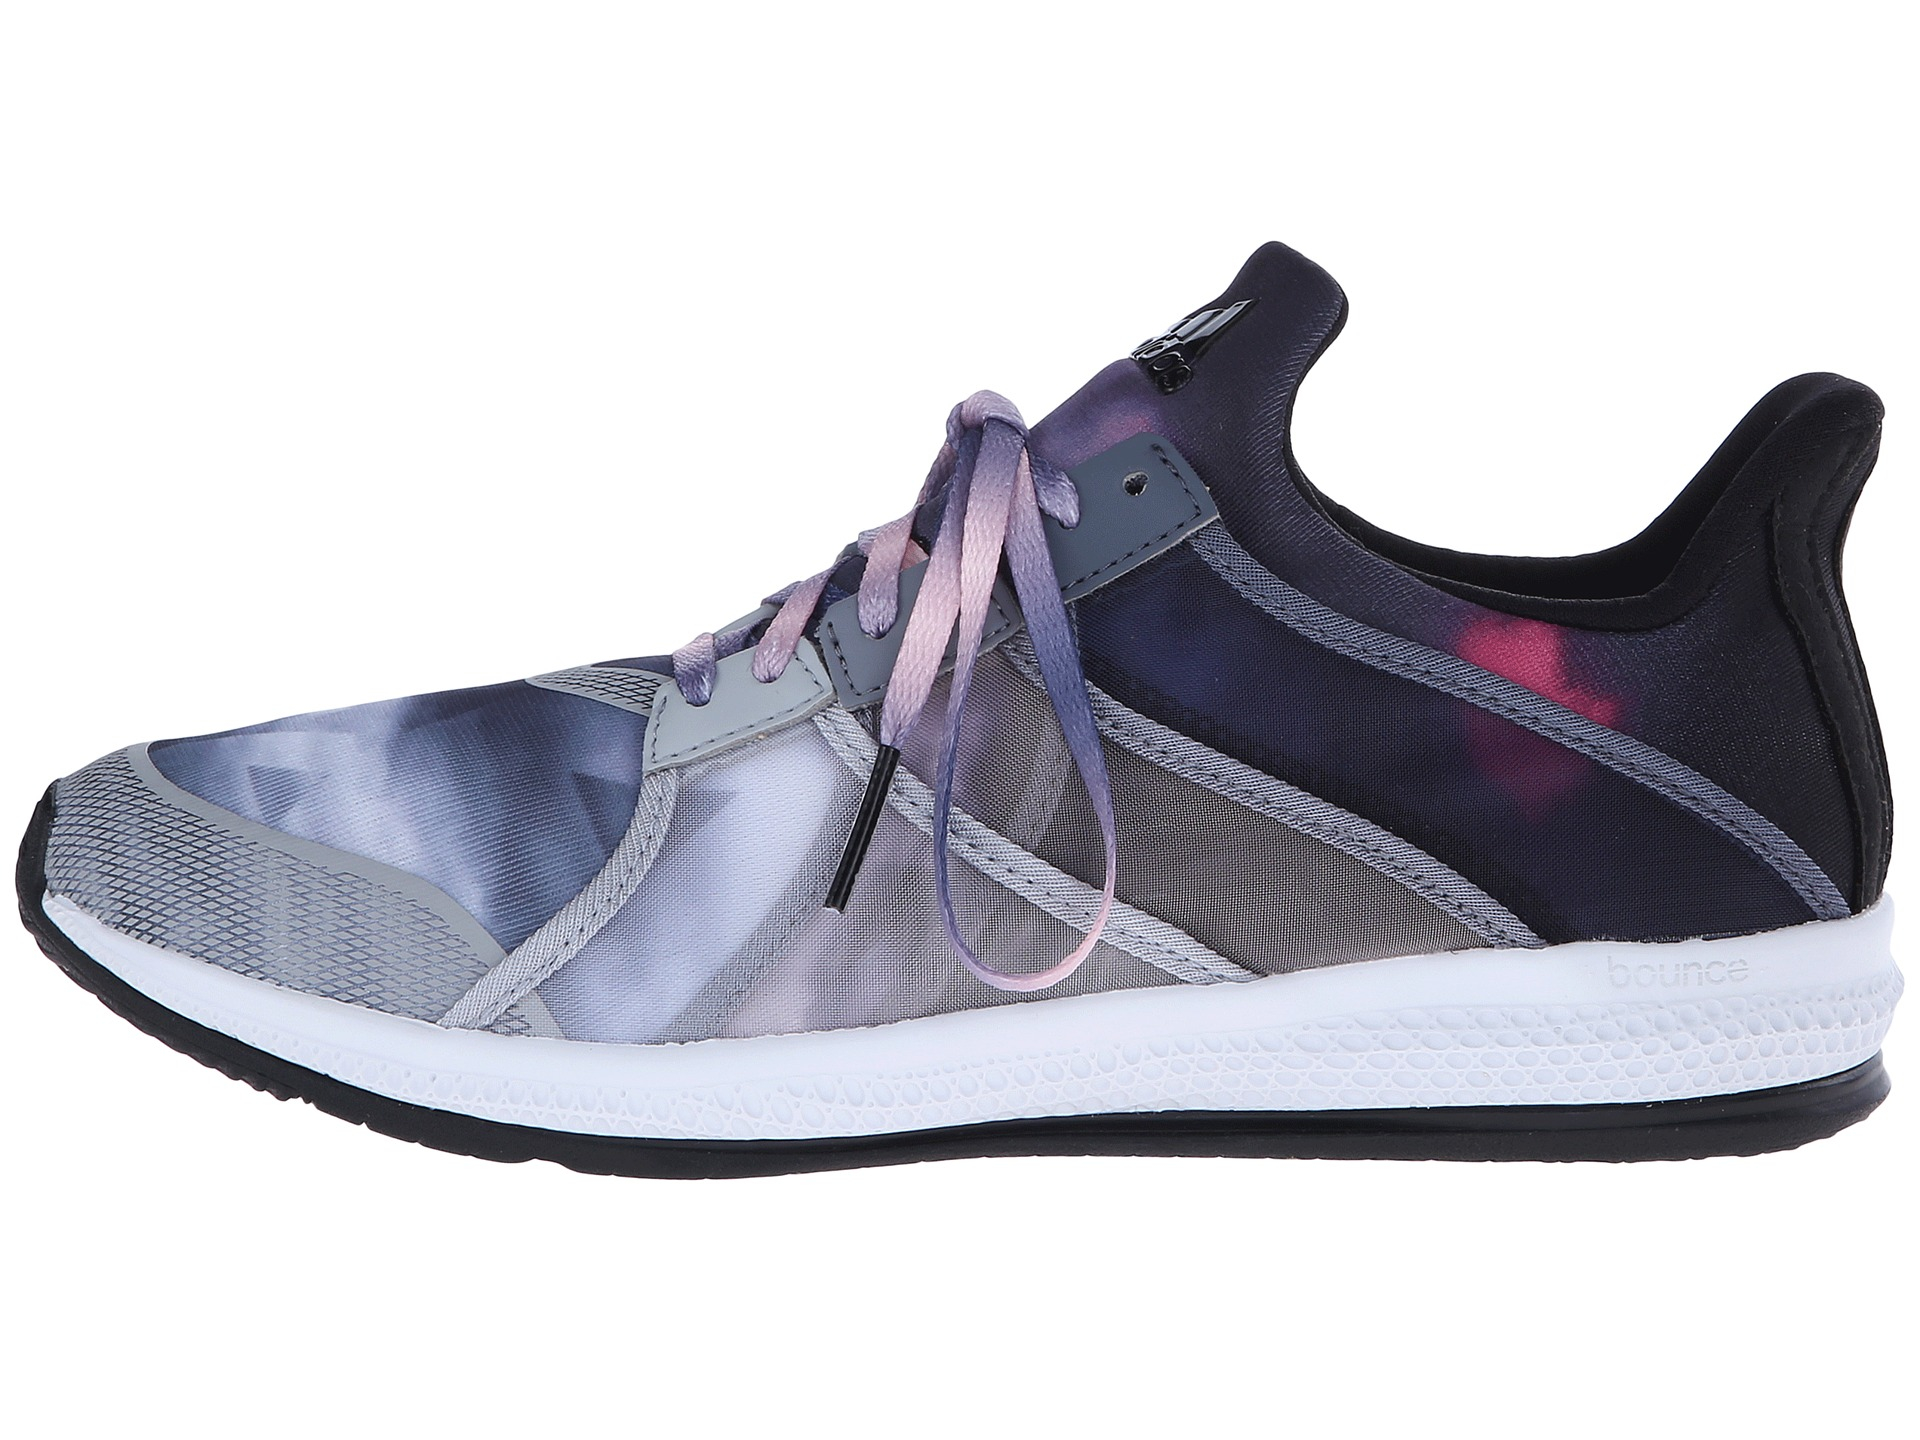 new product f62c6 c06c4 Lyst - adidas Originals Gymbreaker Bounce in Black